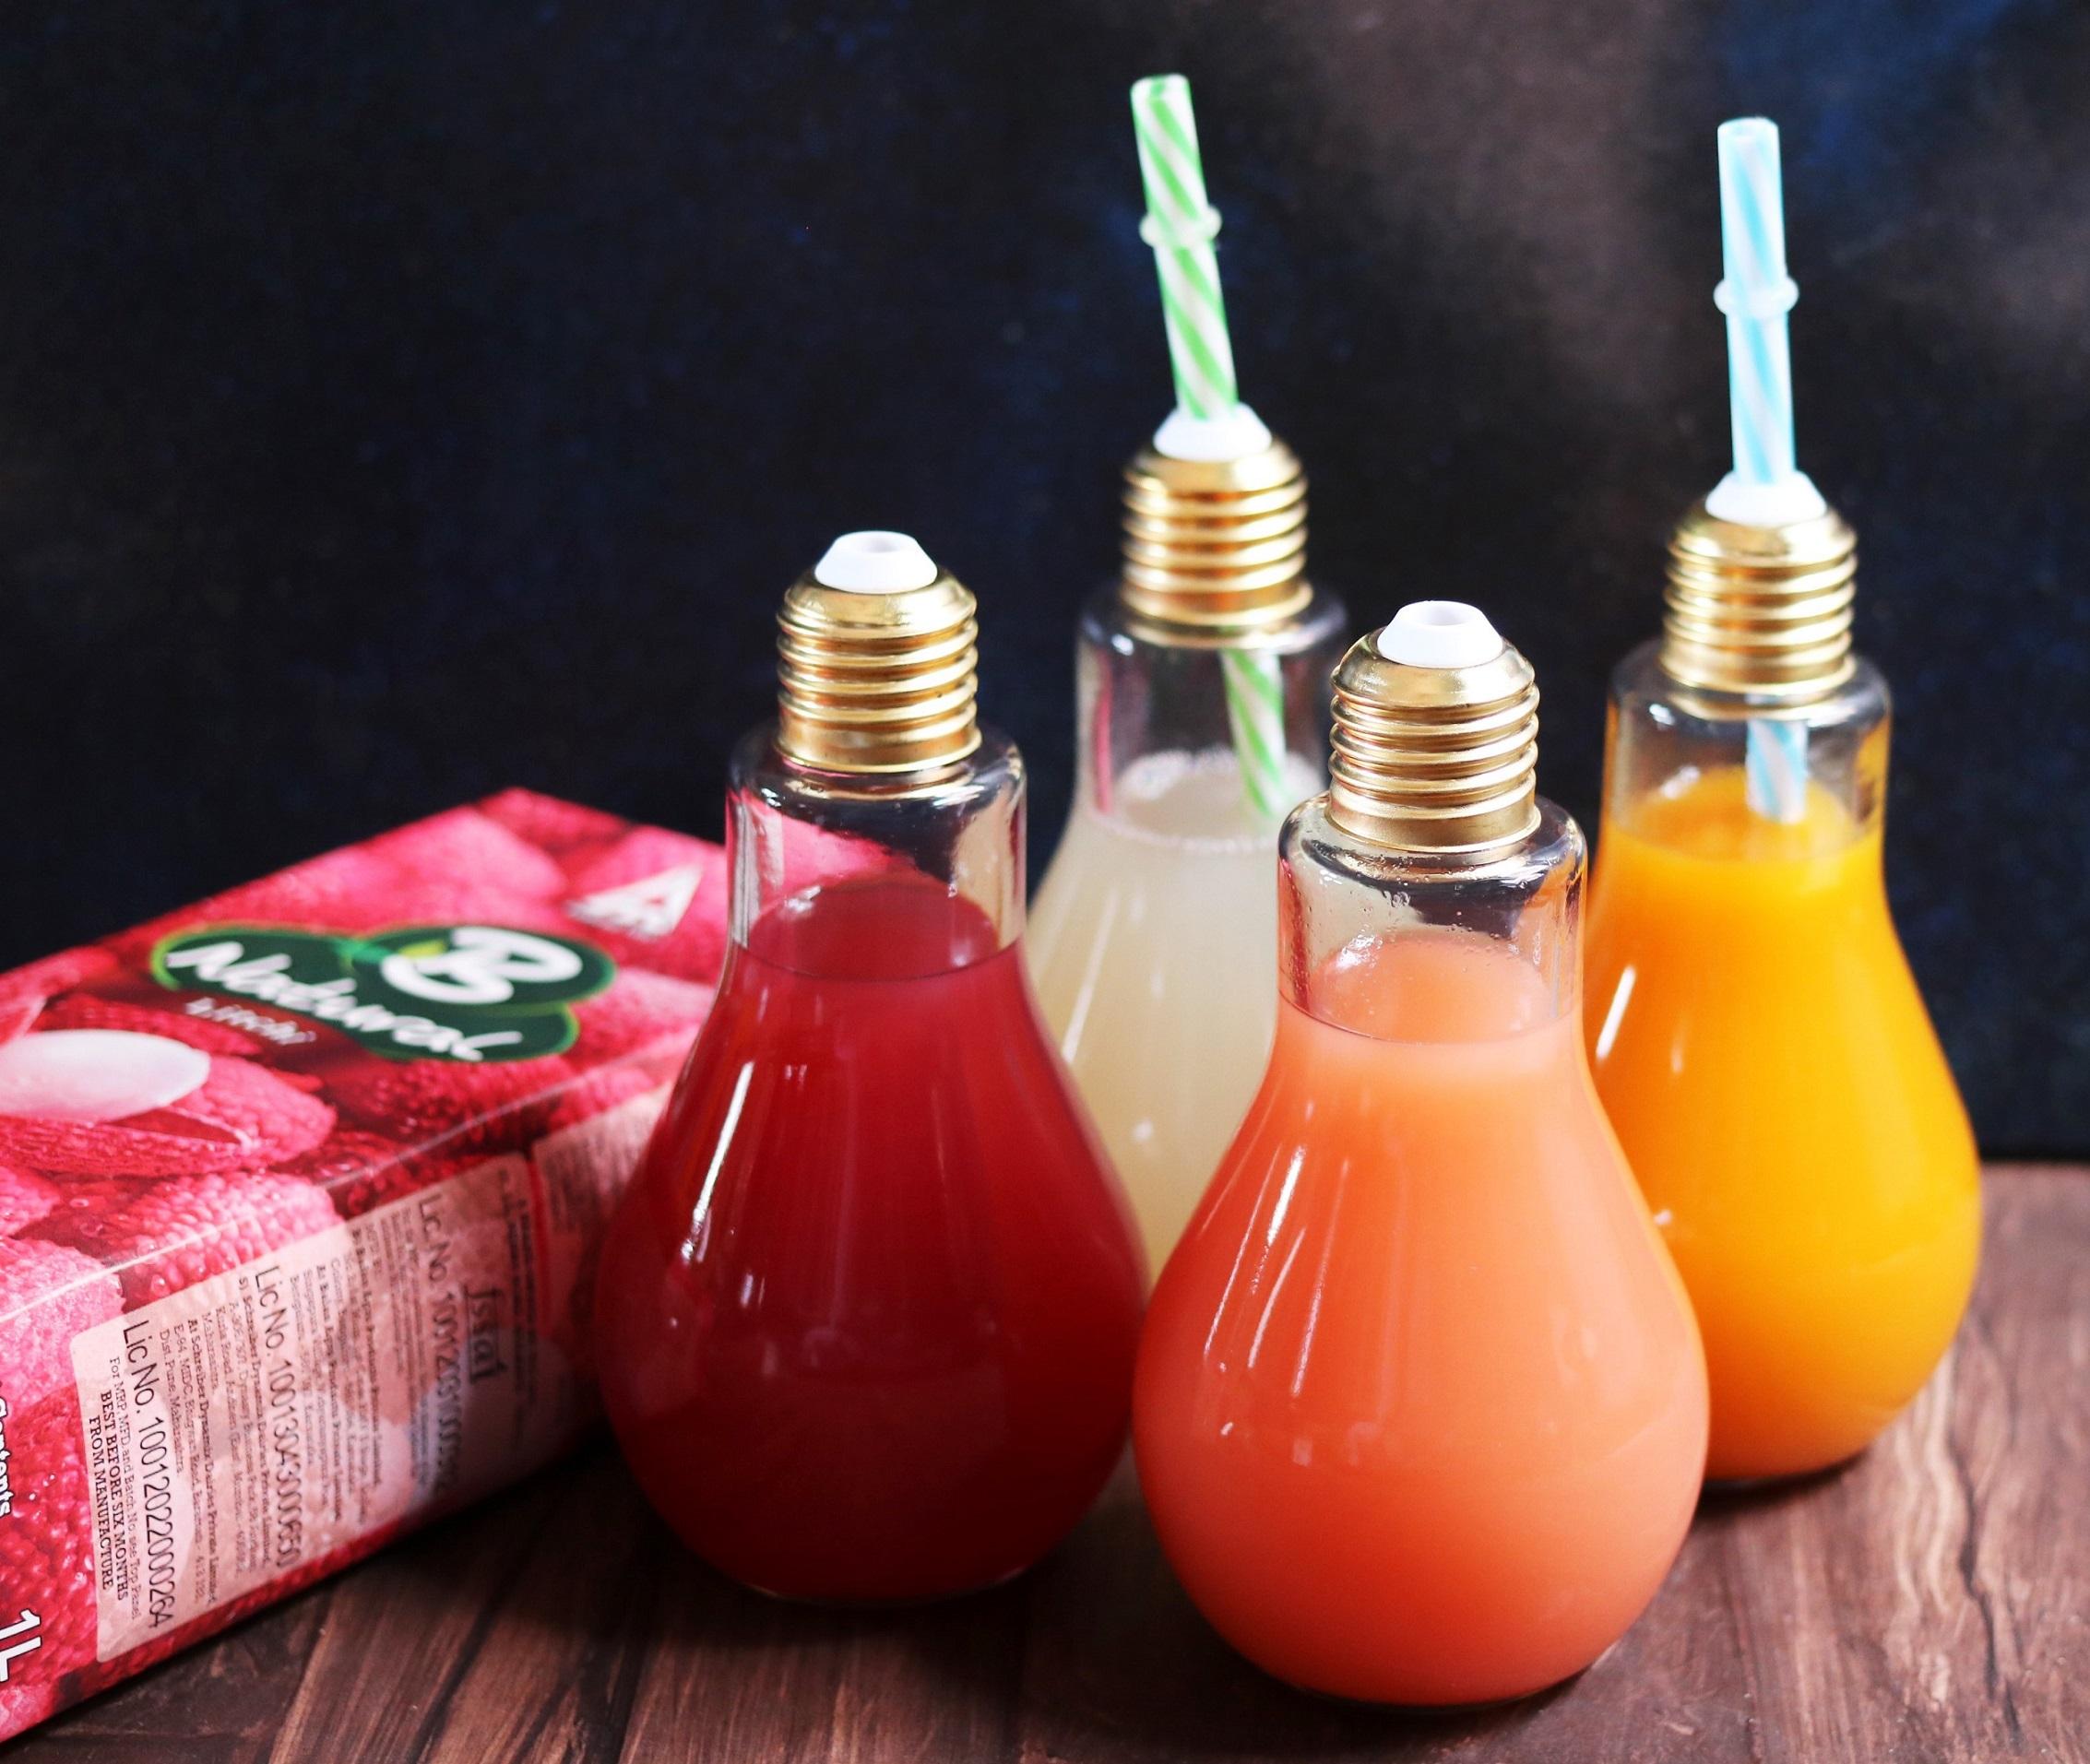 B Natural Fruit Juices